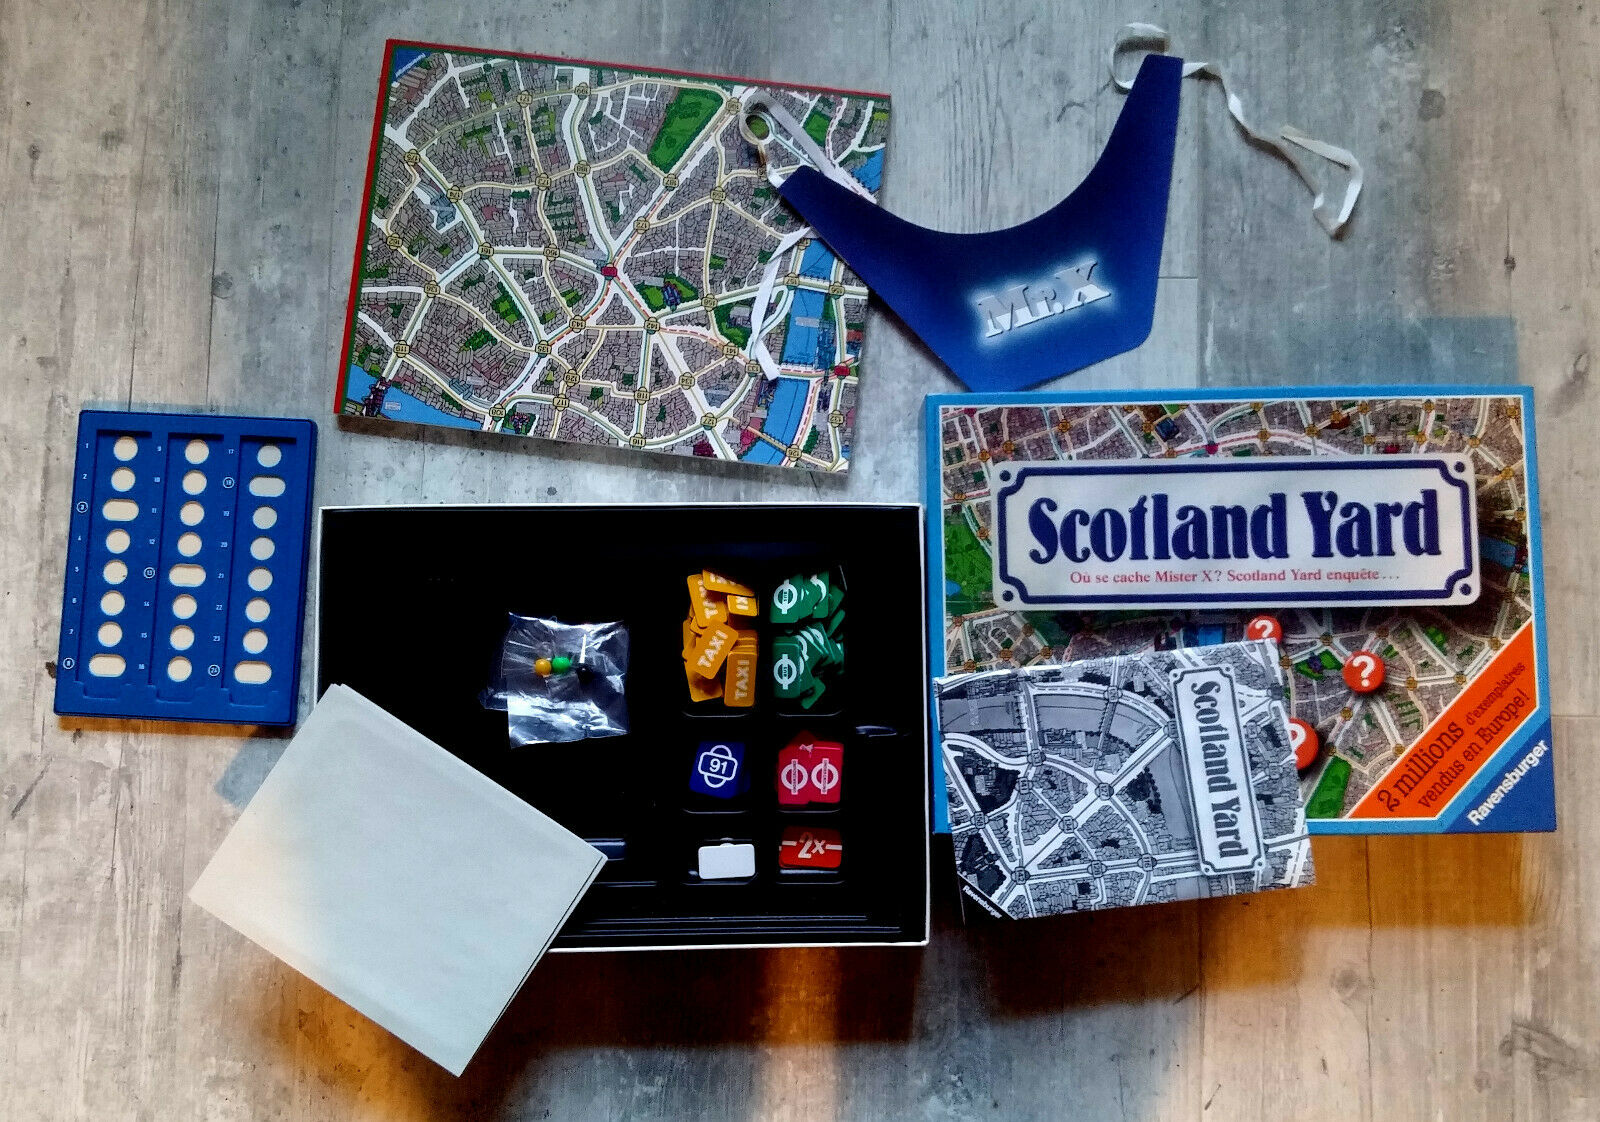 Scotland Yard Jeu Ravensburger 1984 COMPLET TRES BON ETAT collection